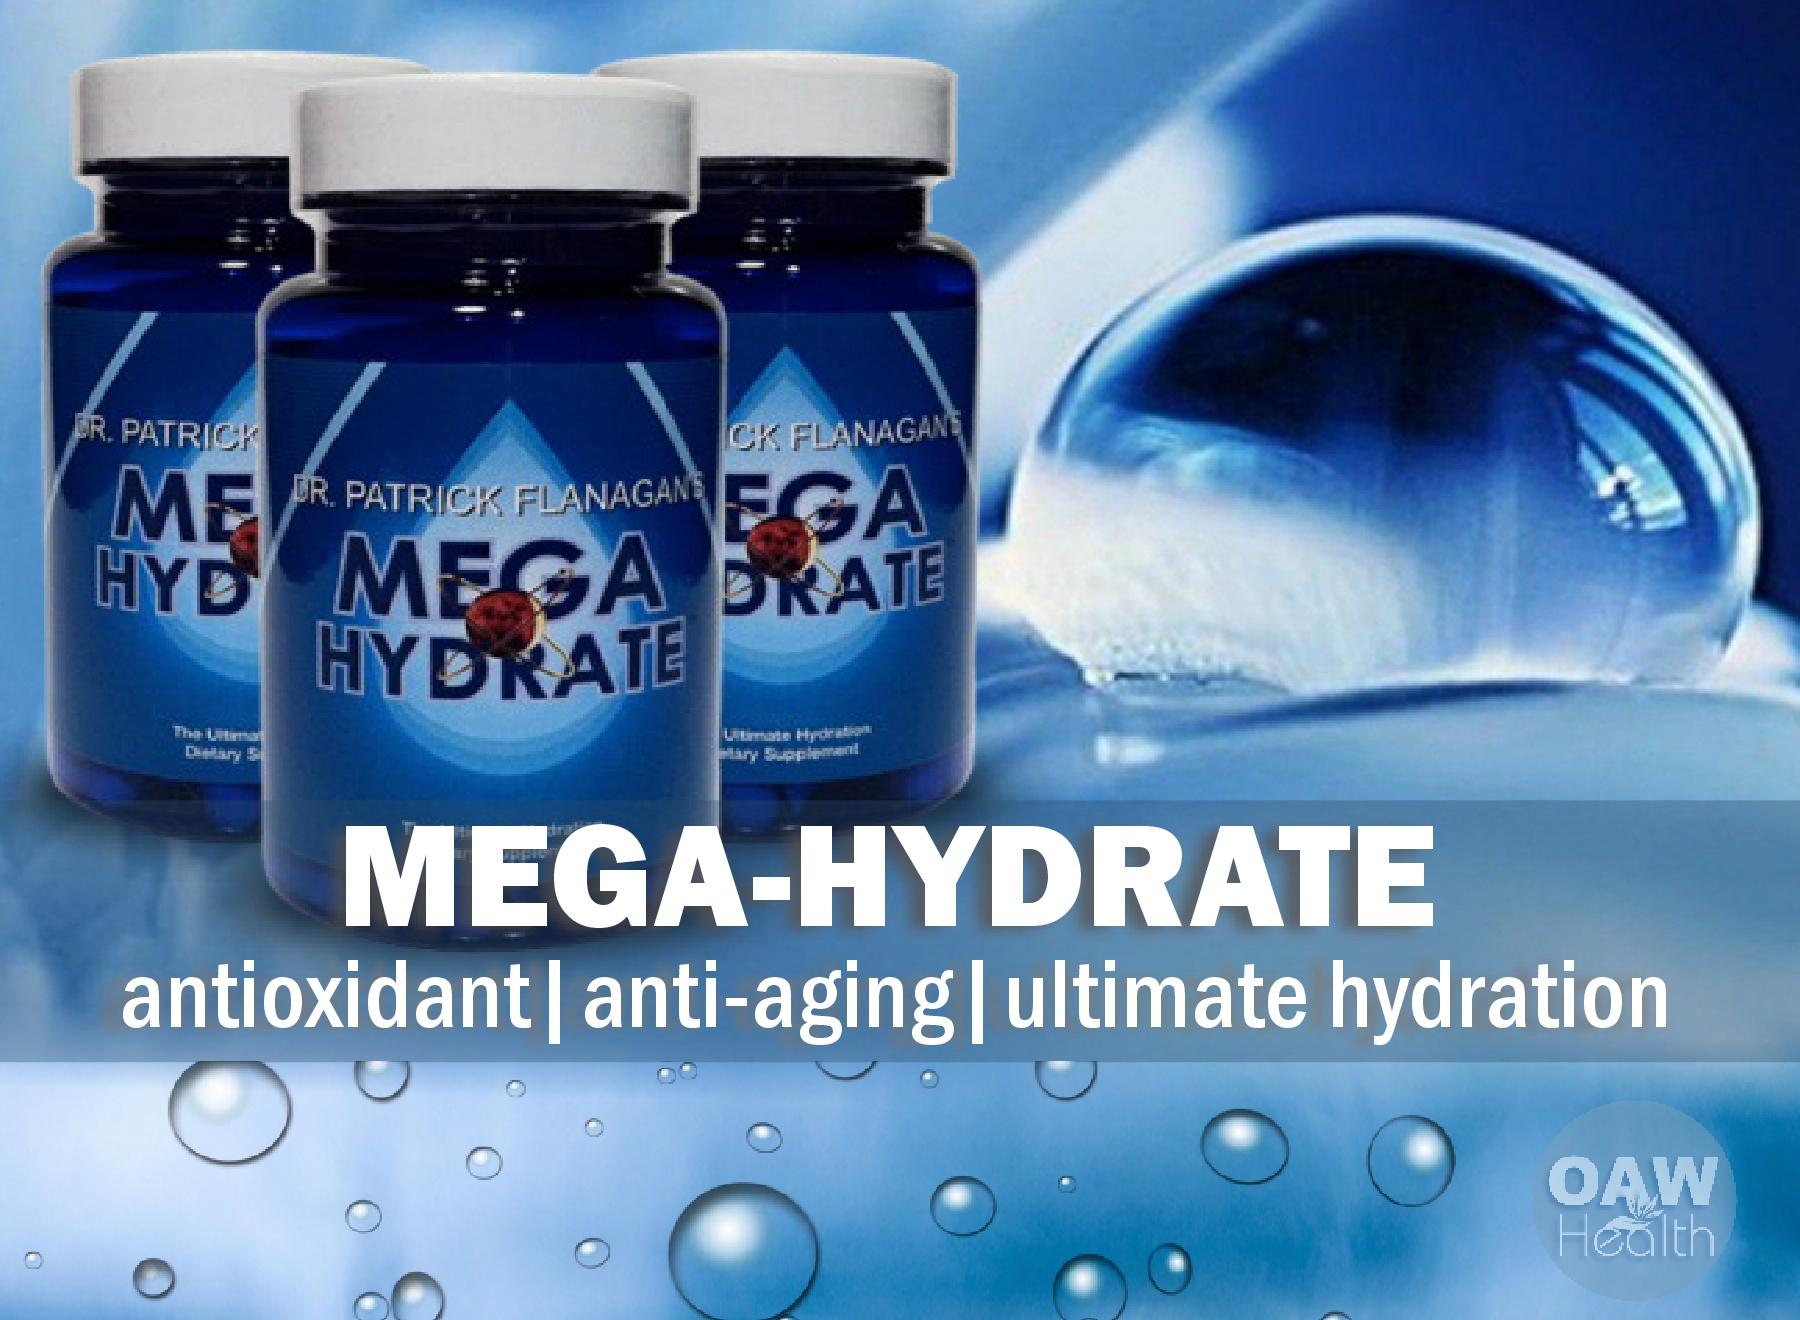 MegaHydrate – Antioxidant, Anti-Aging & Hydration Benefits